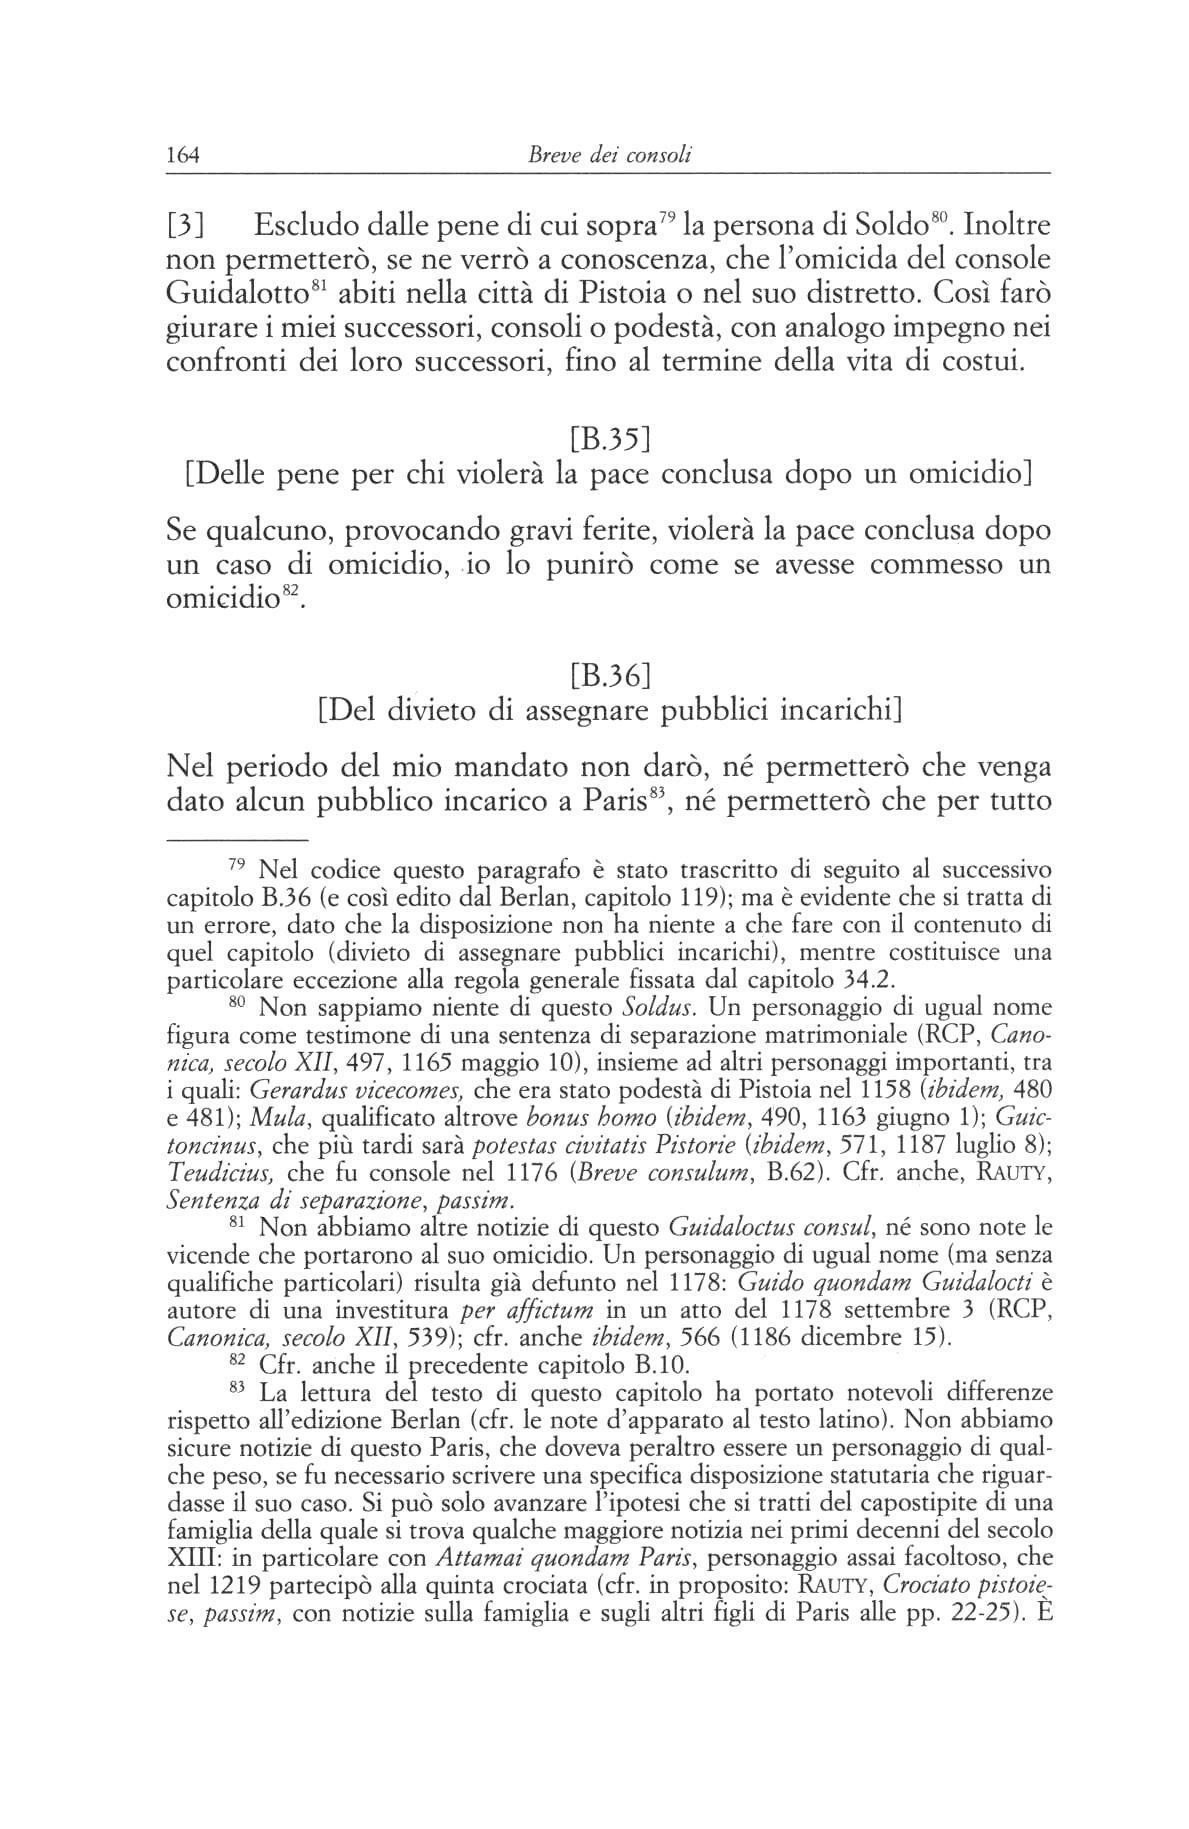 statuti pistoiesi del sec.XII 0164.jpg